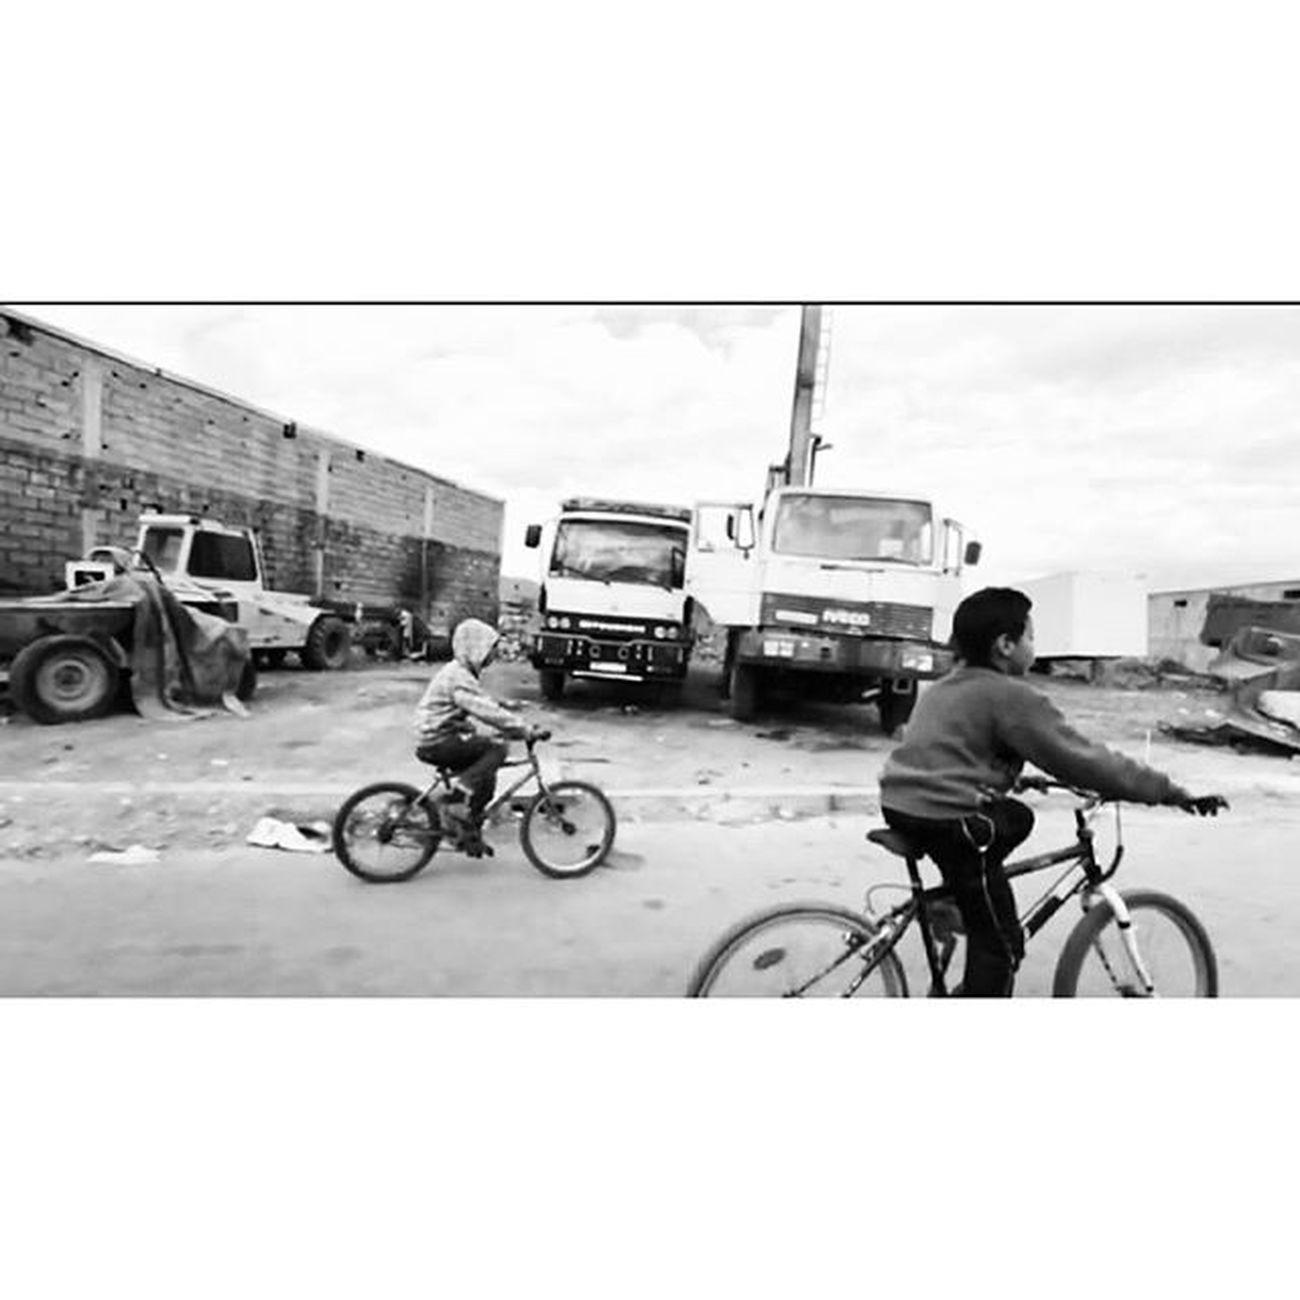 Blackandwhitephotography . Picoftheday Beautufullchild . LHAYL7AFI 04 . Onstagood Instagram . LIKETHEPIC Follome .